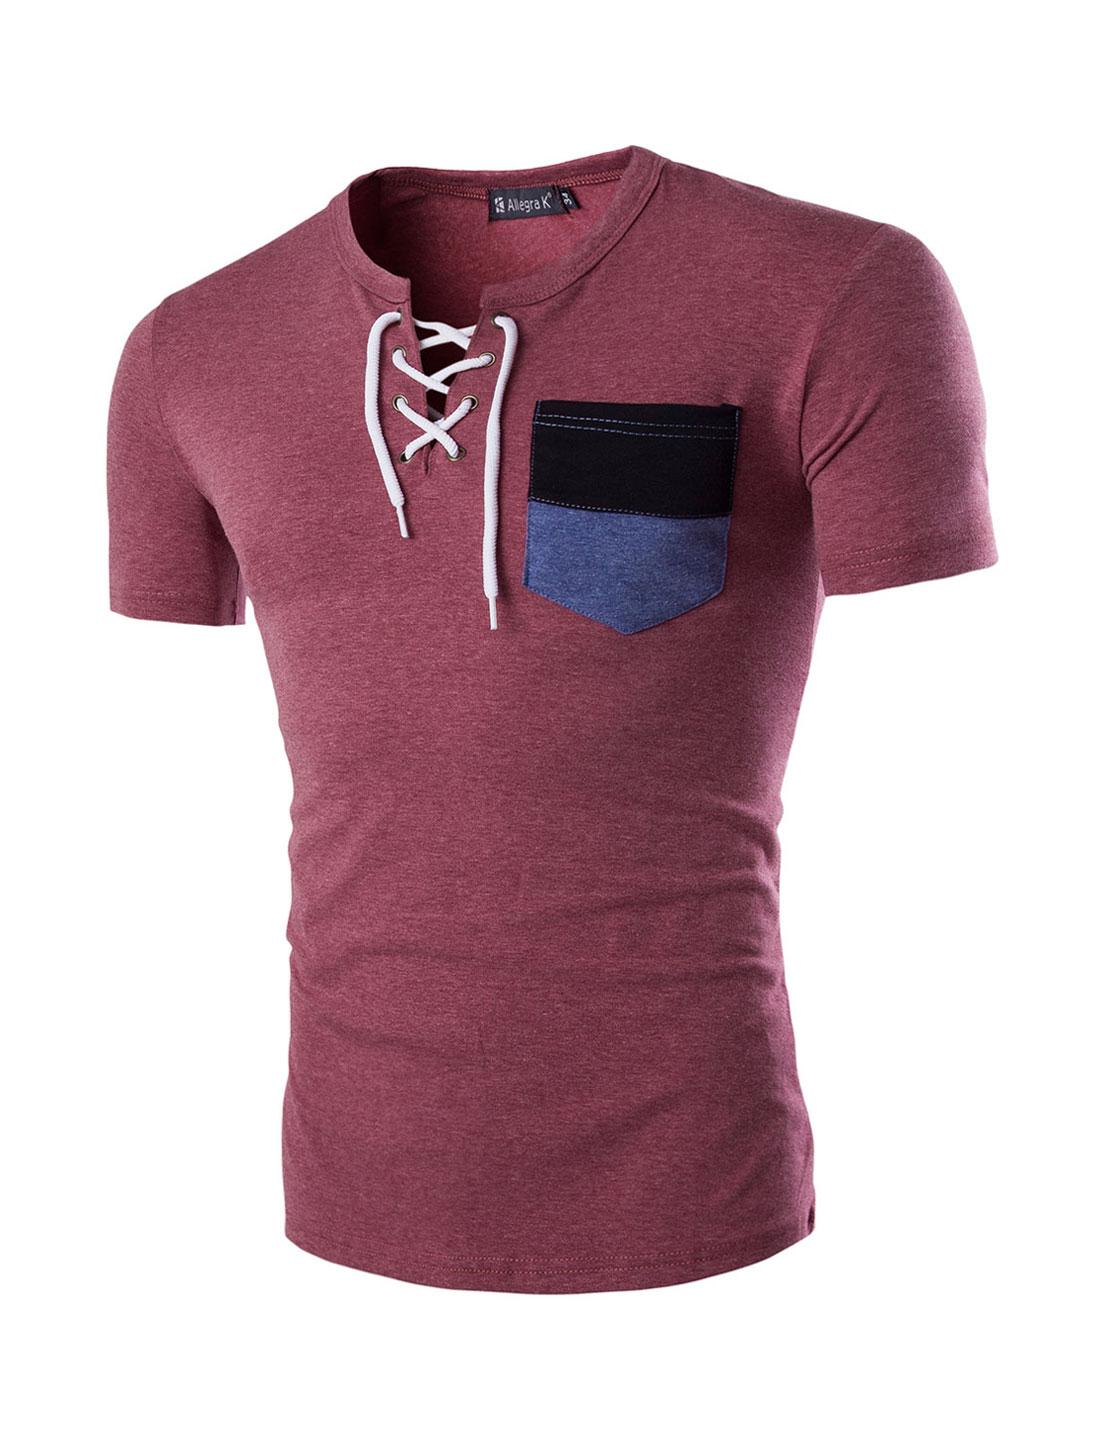 Man Round Neck Short Sleeves Chest Pocket T-Shirts Burgundy L